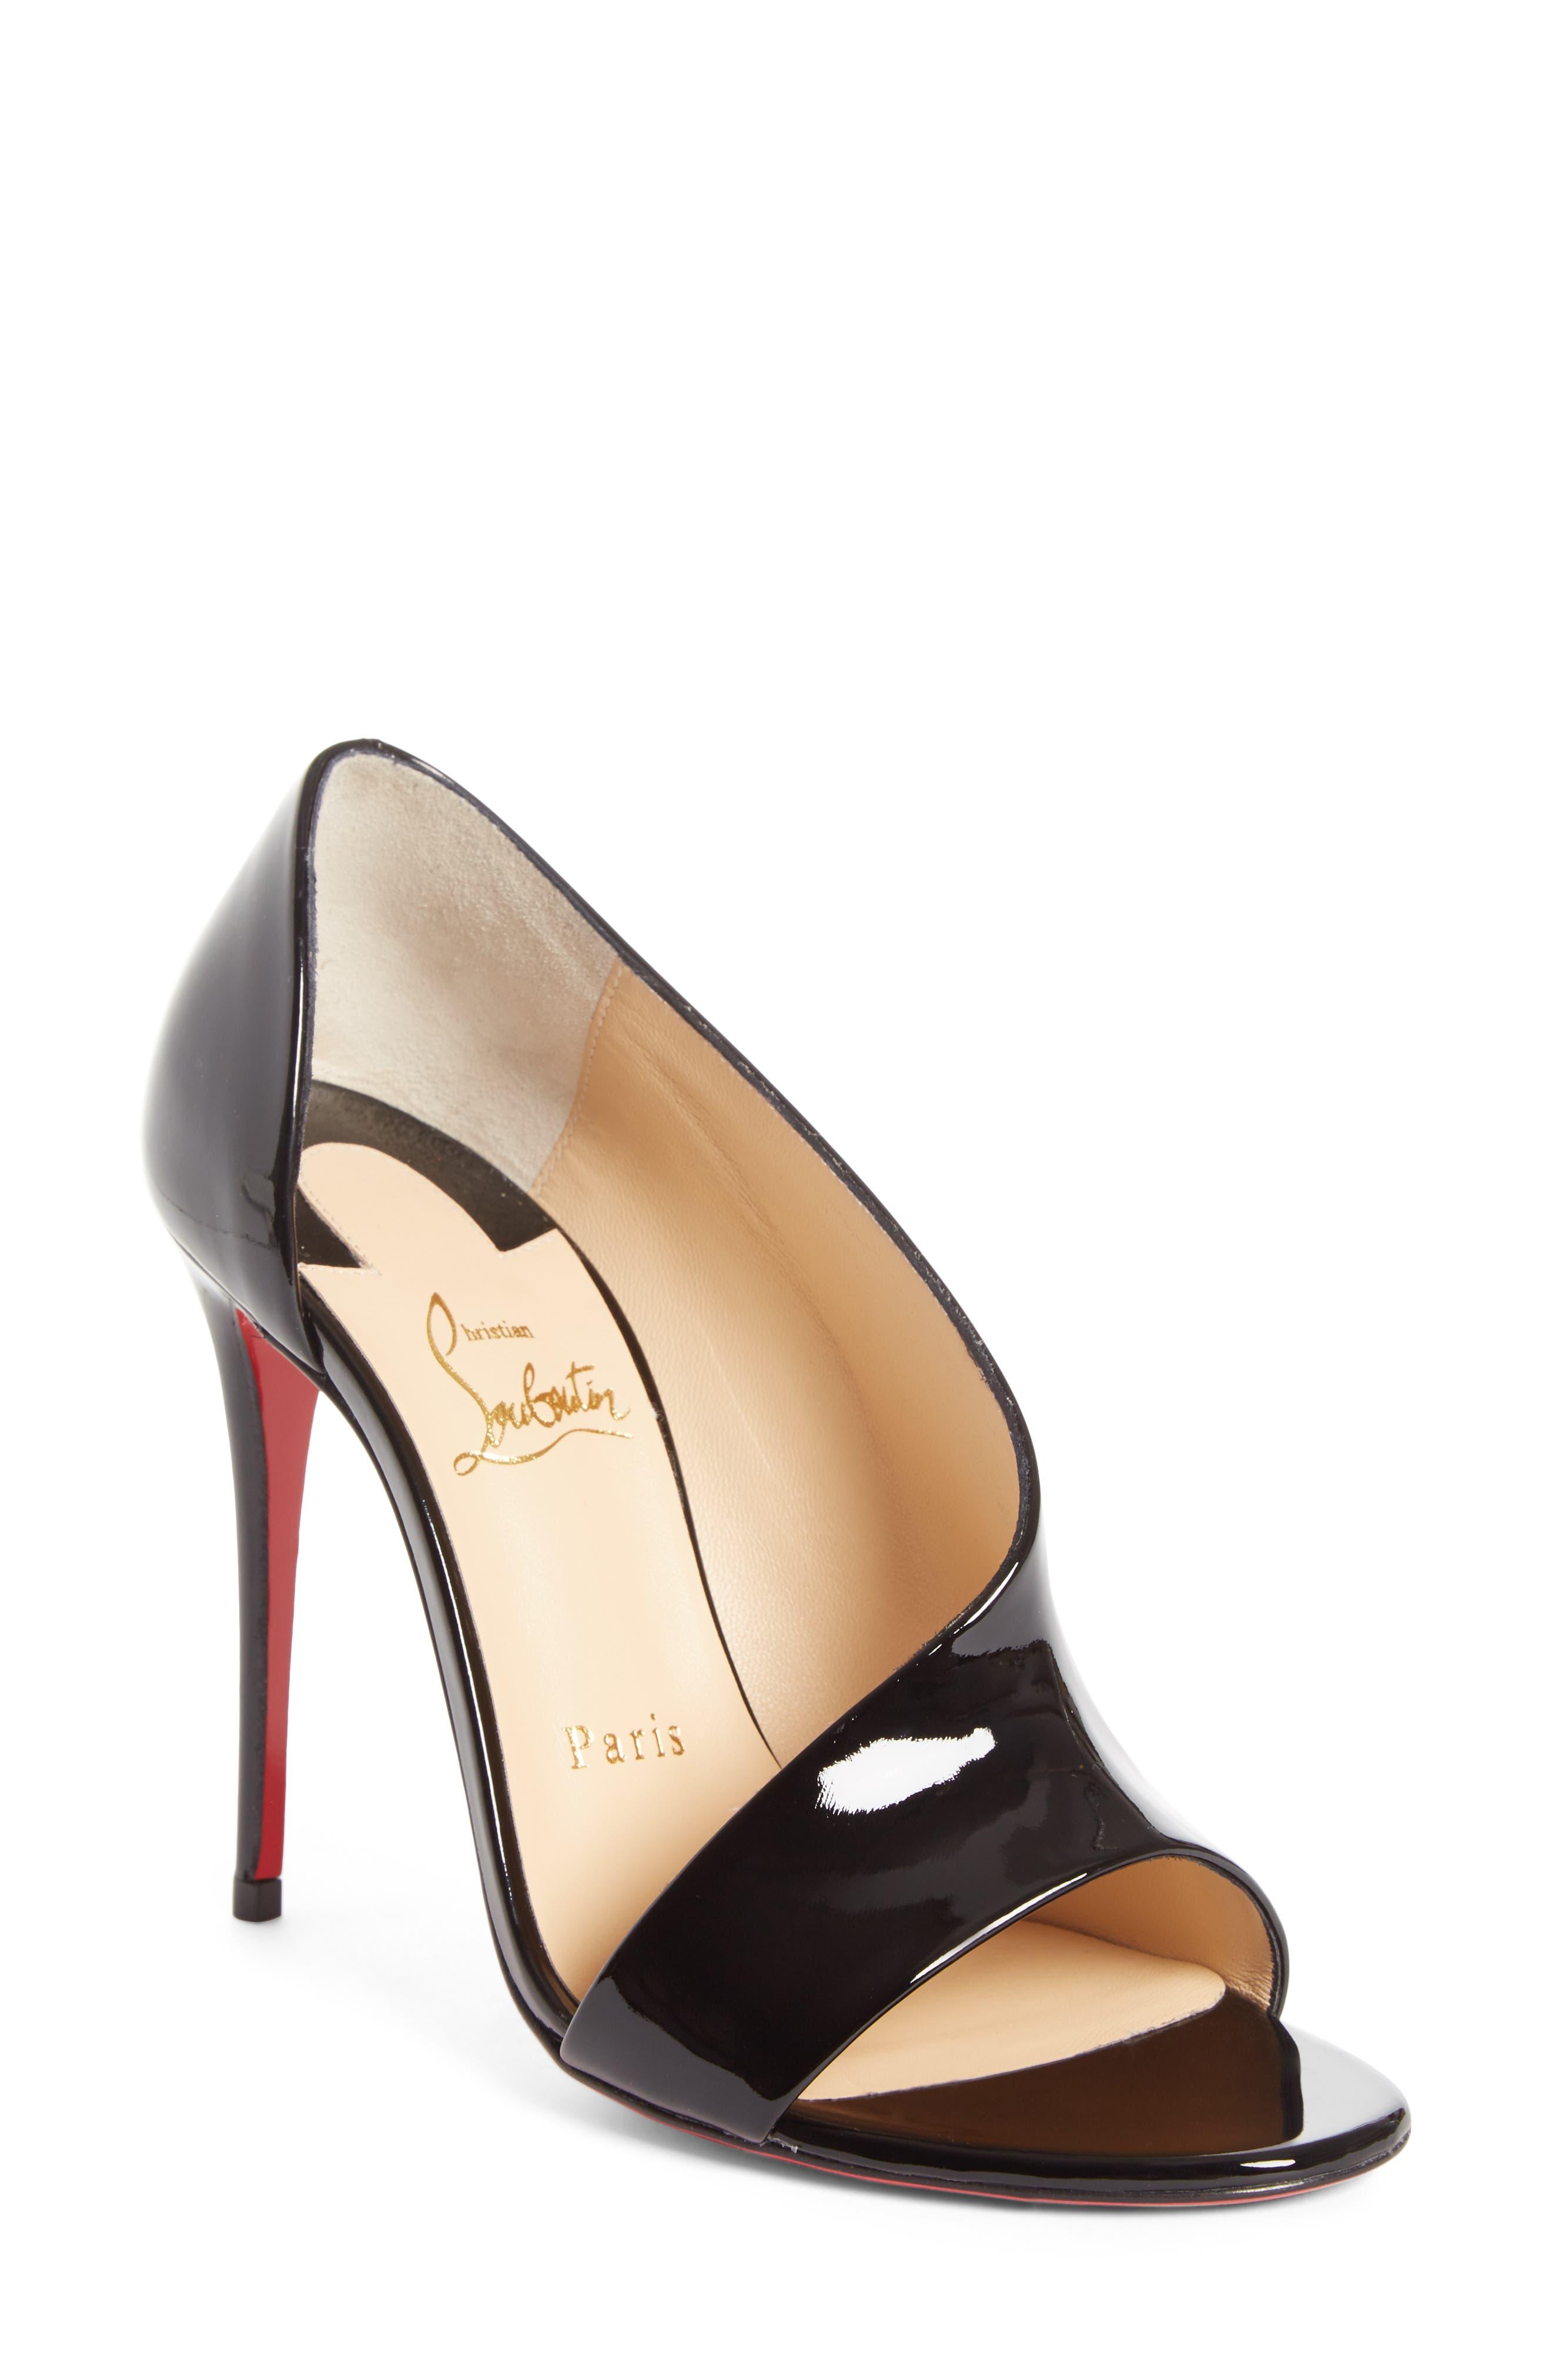 Phoebe Half d'Orsay Sandal,                             Main thumbnail 1, color,                             Black Patent